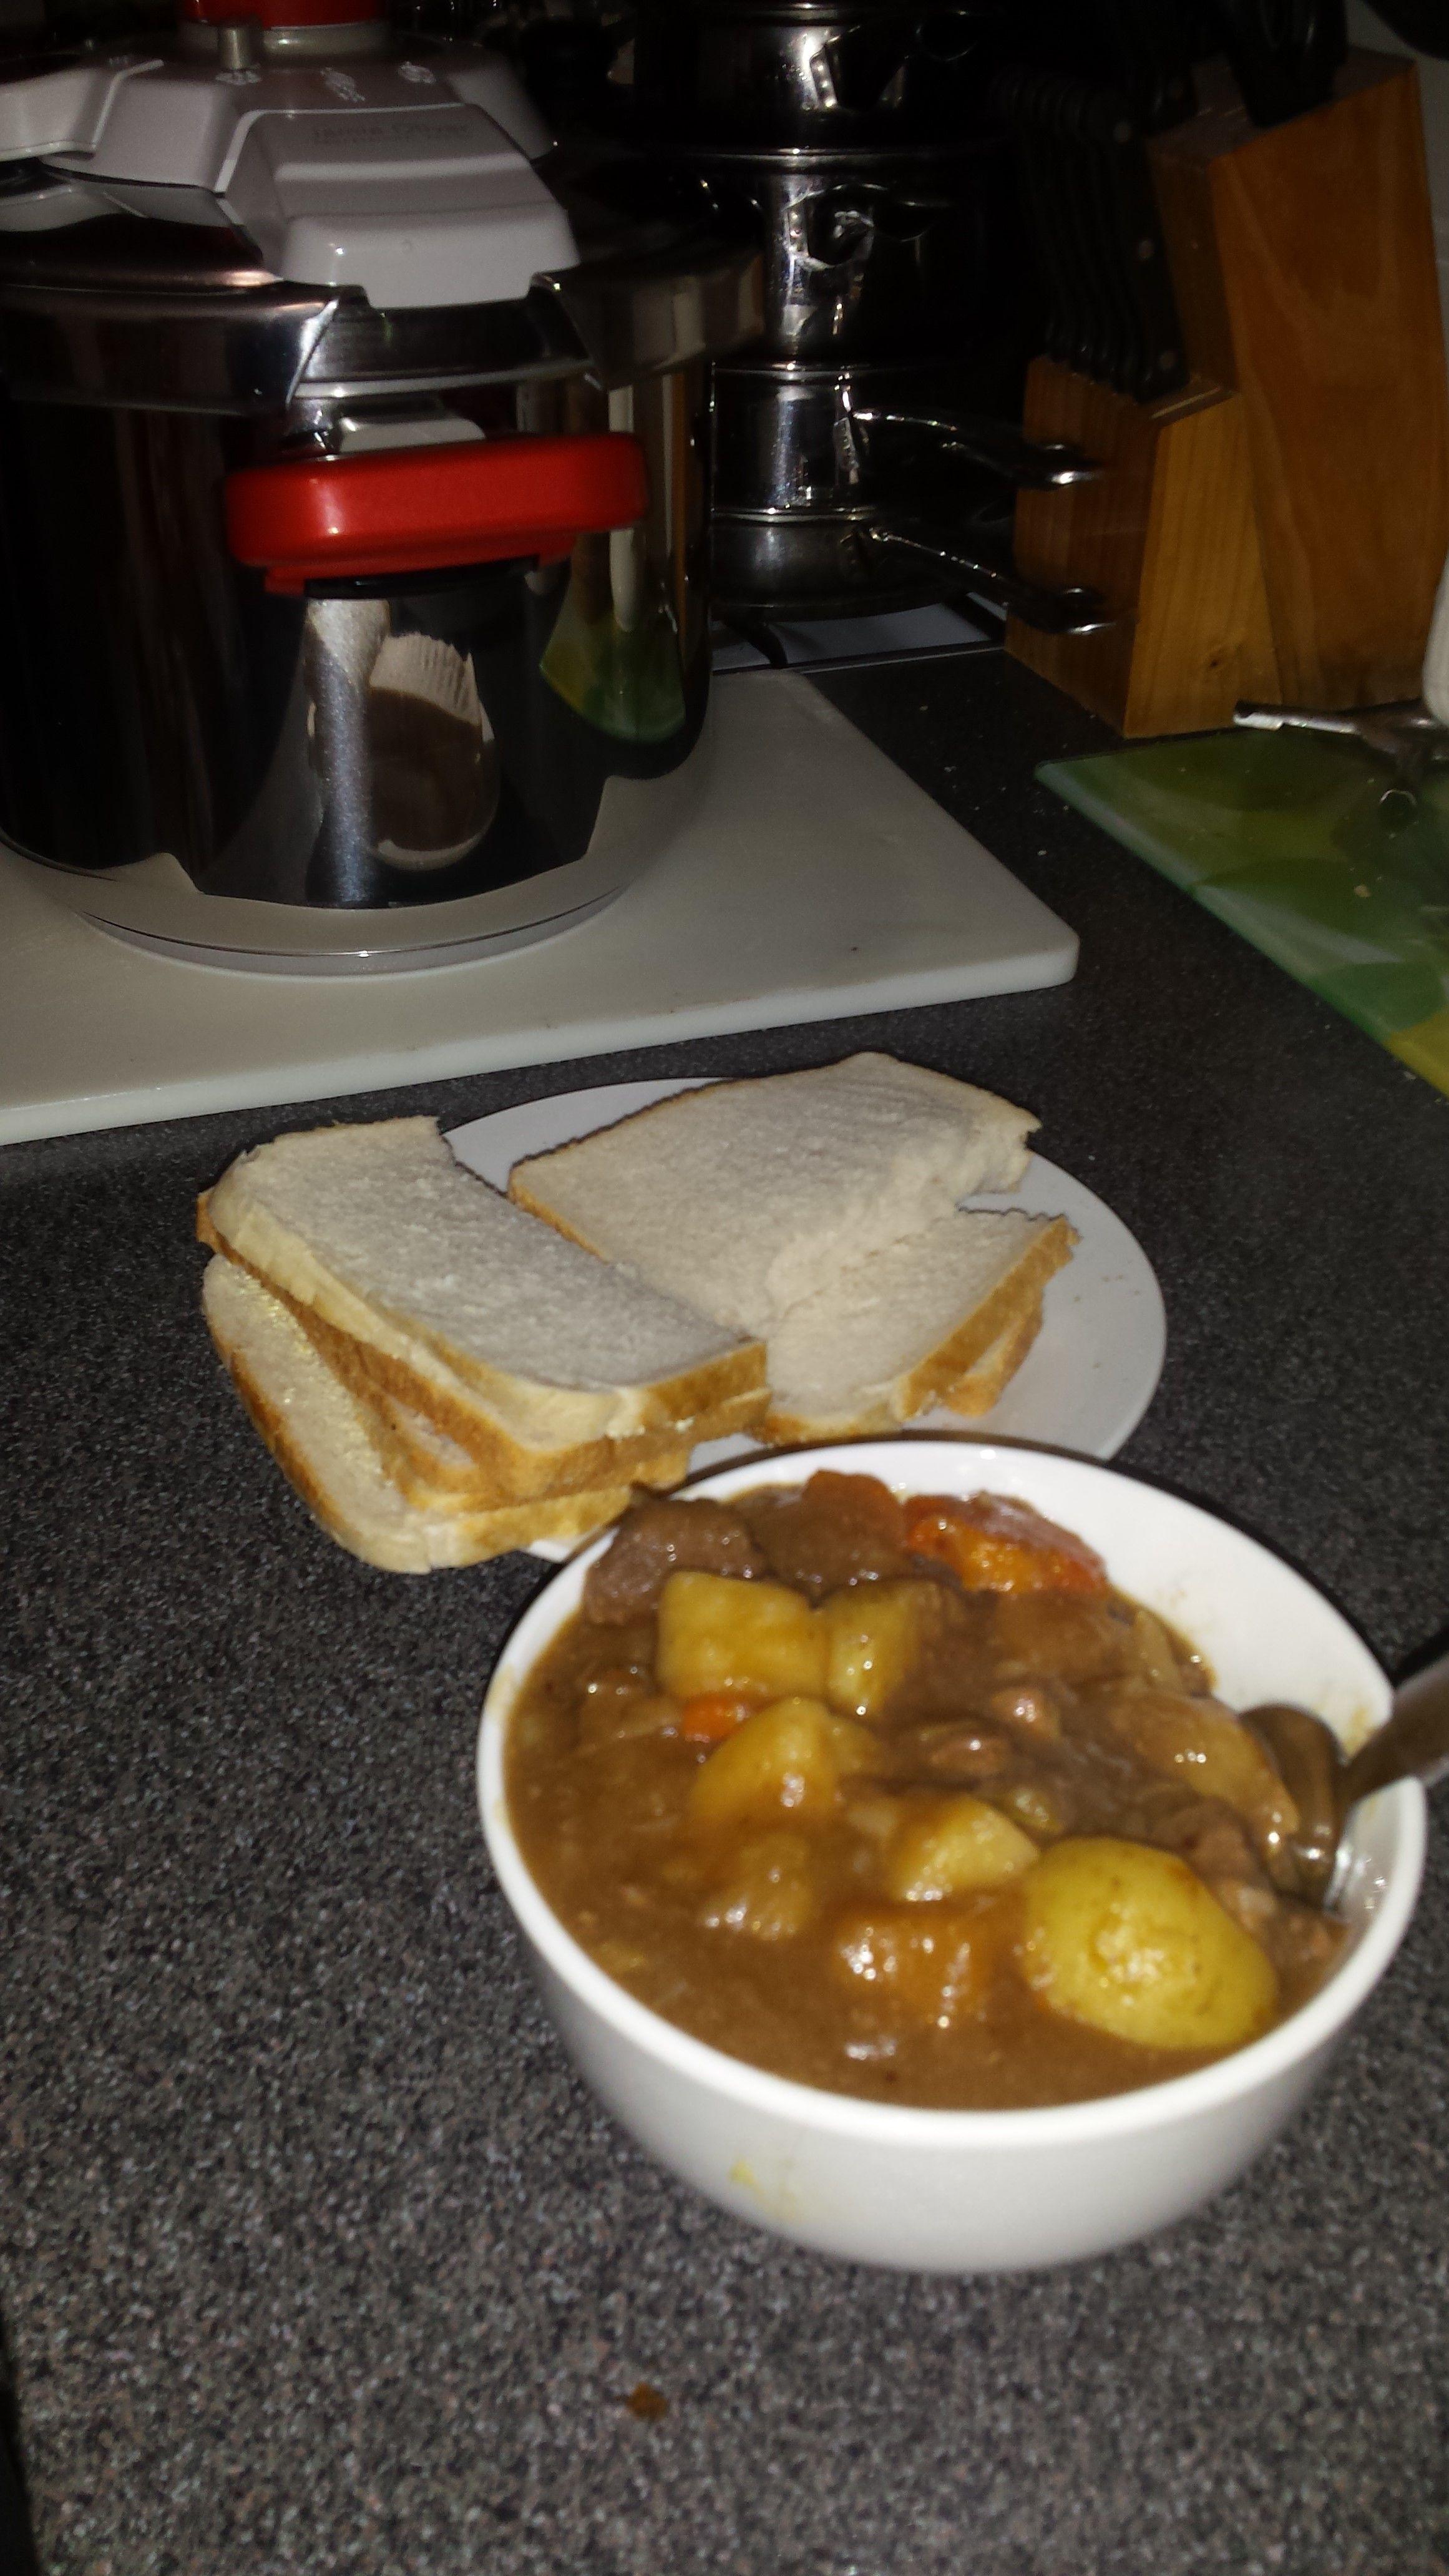 Beef Stew Allrecipes  Pressure cooker beef stew recipe All recipes UK